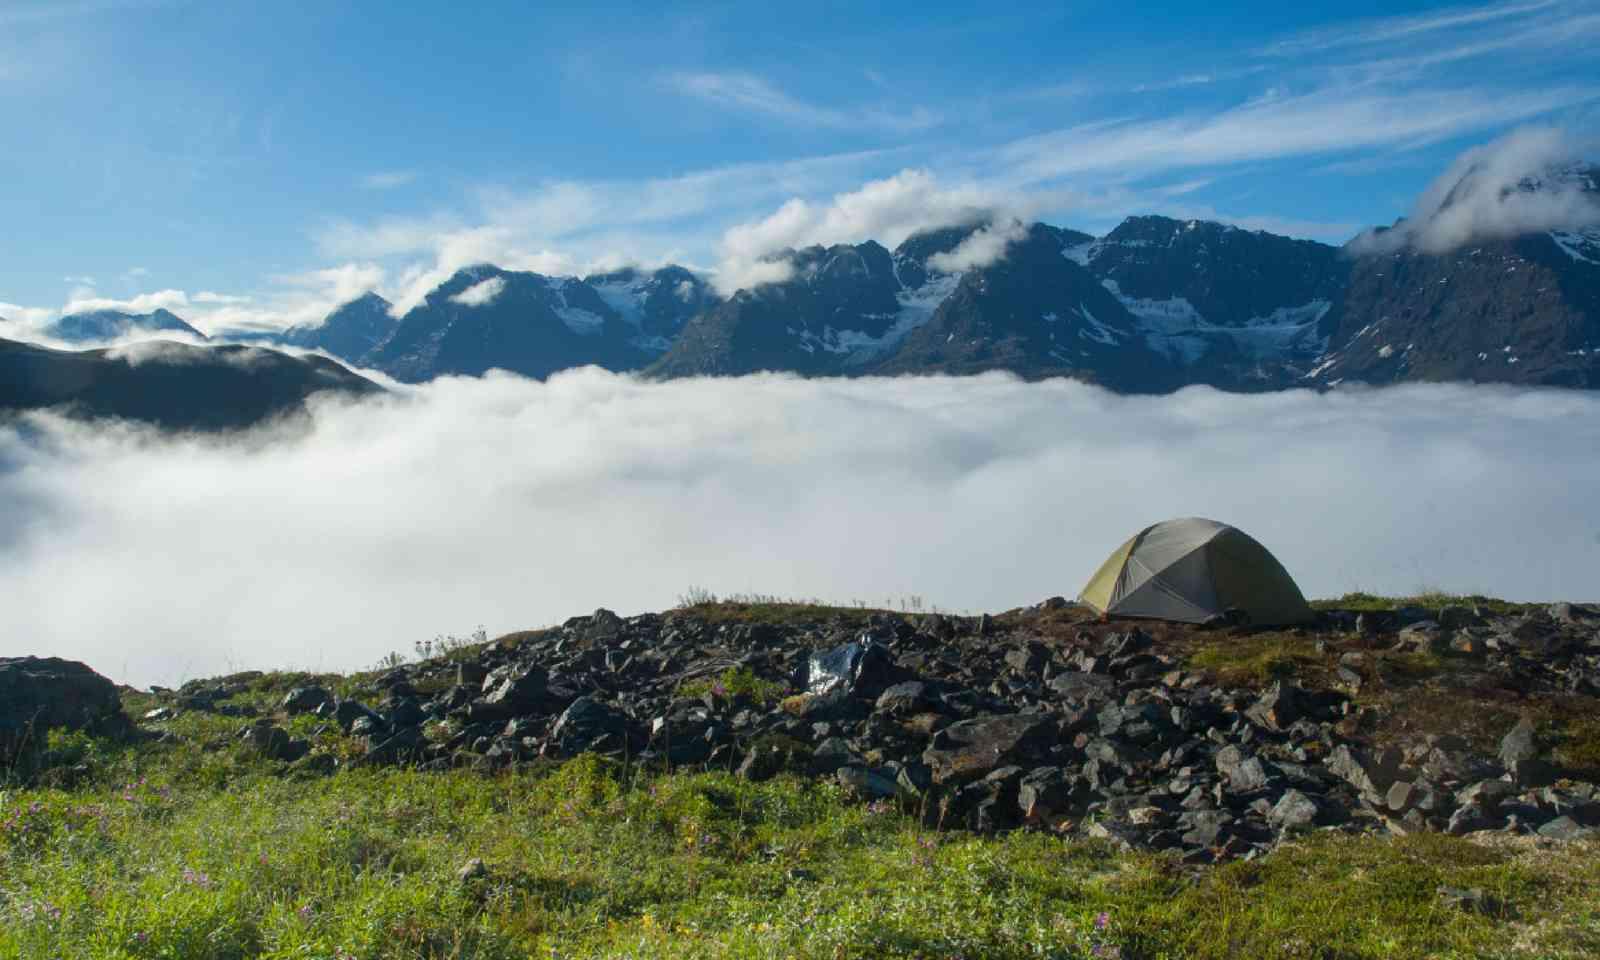 Camping in the Wrangell-St Elias National Park, Alaska (Shutterstock)